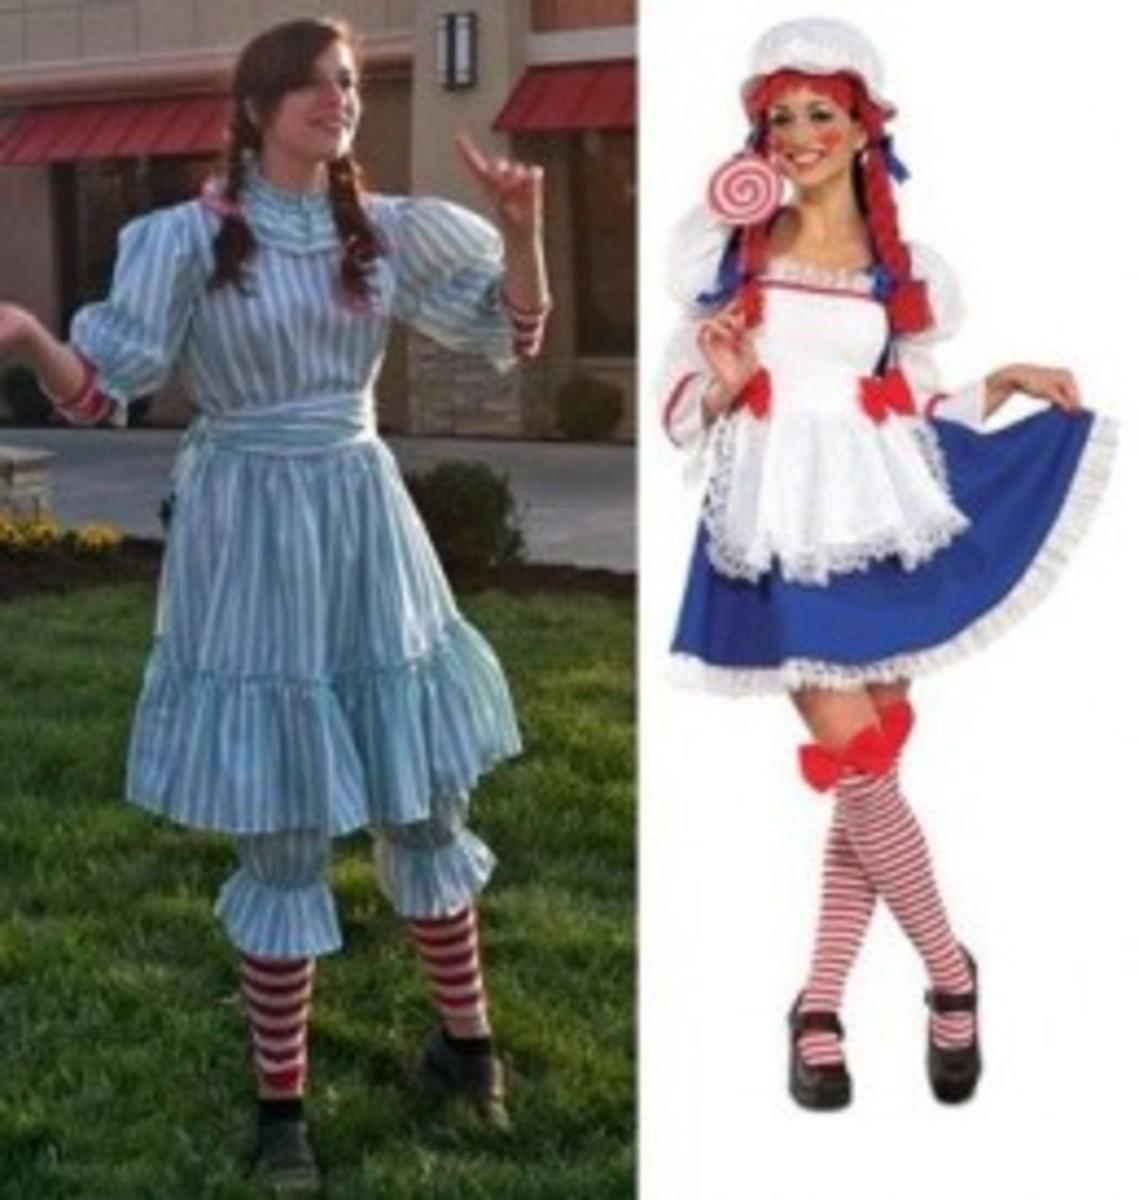 Wendy's Costume Looks like Ragdoll